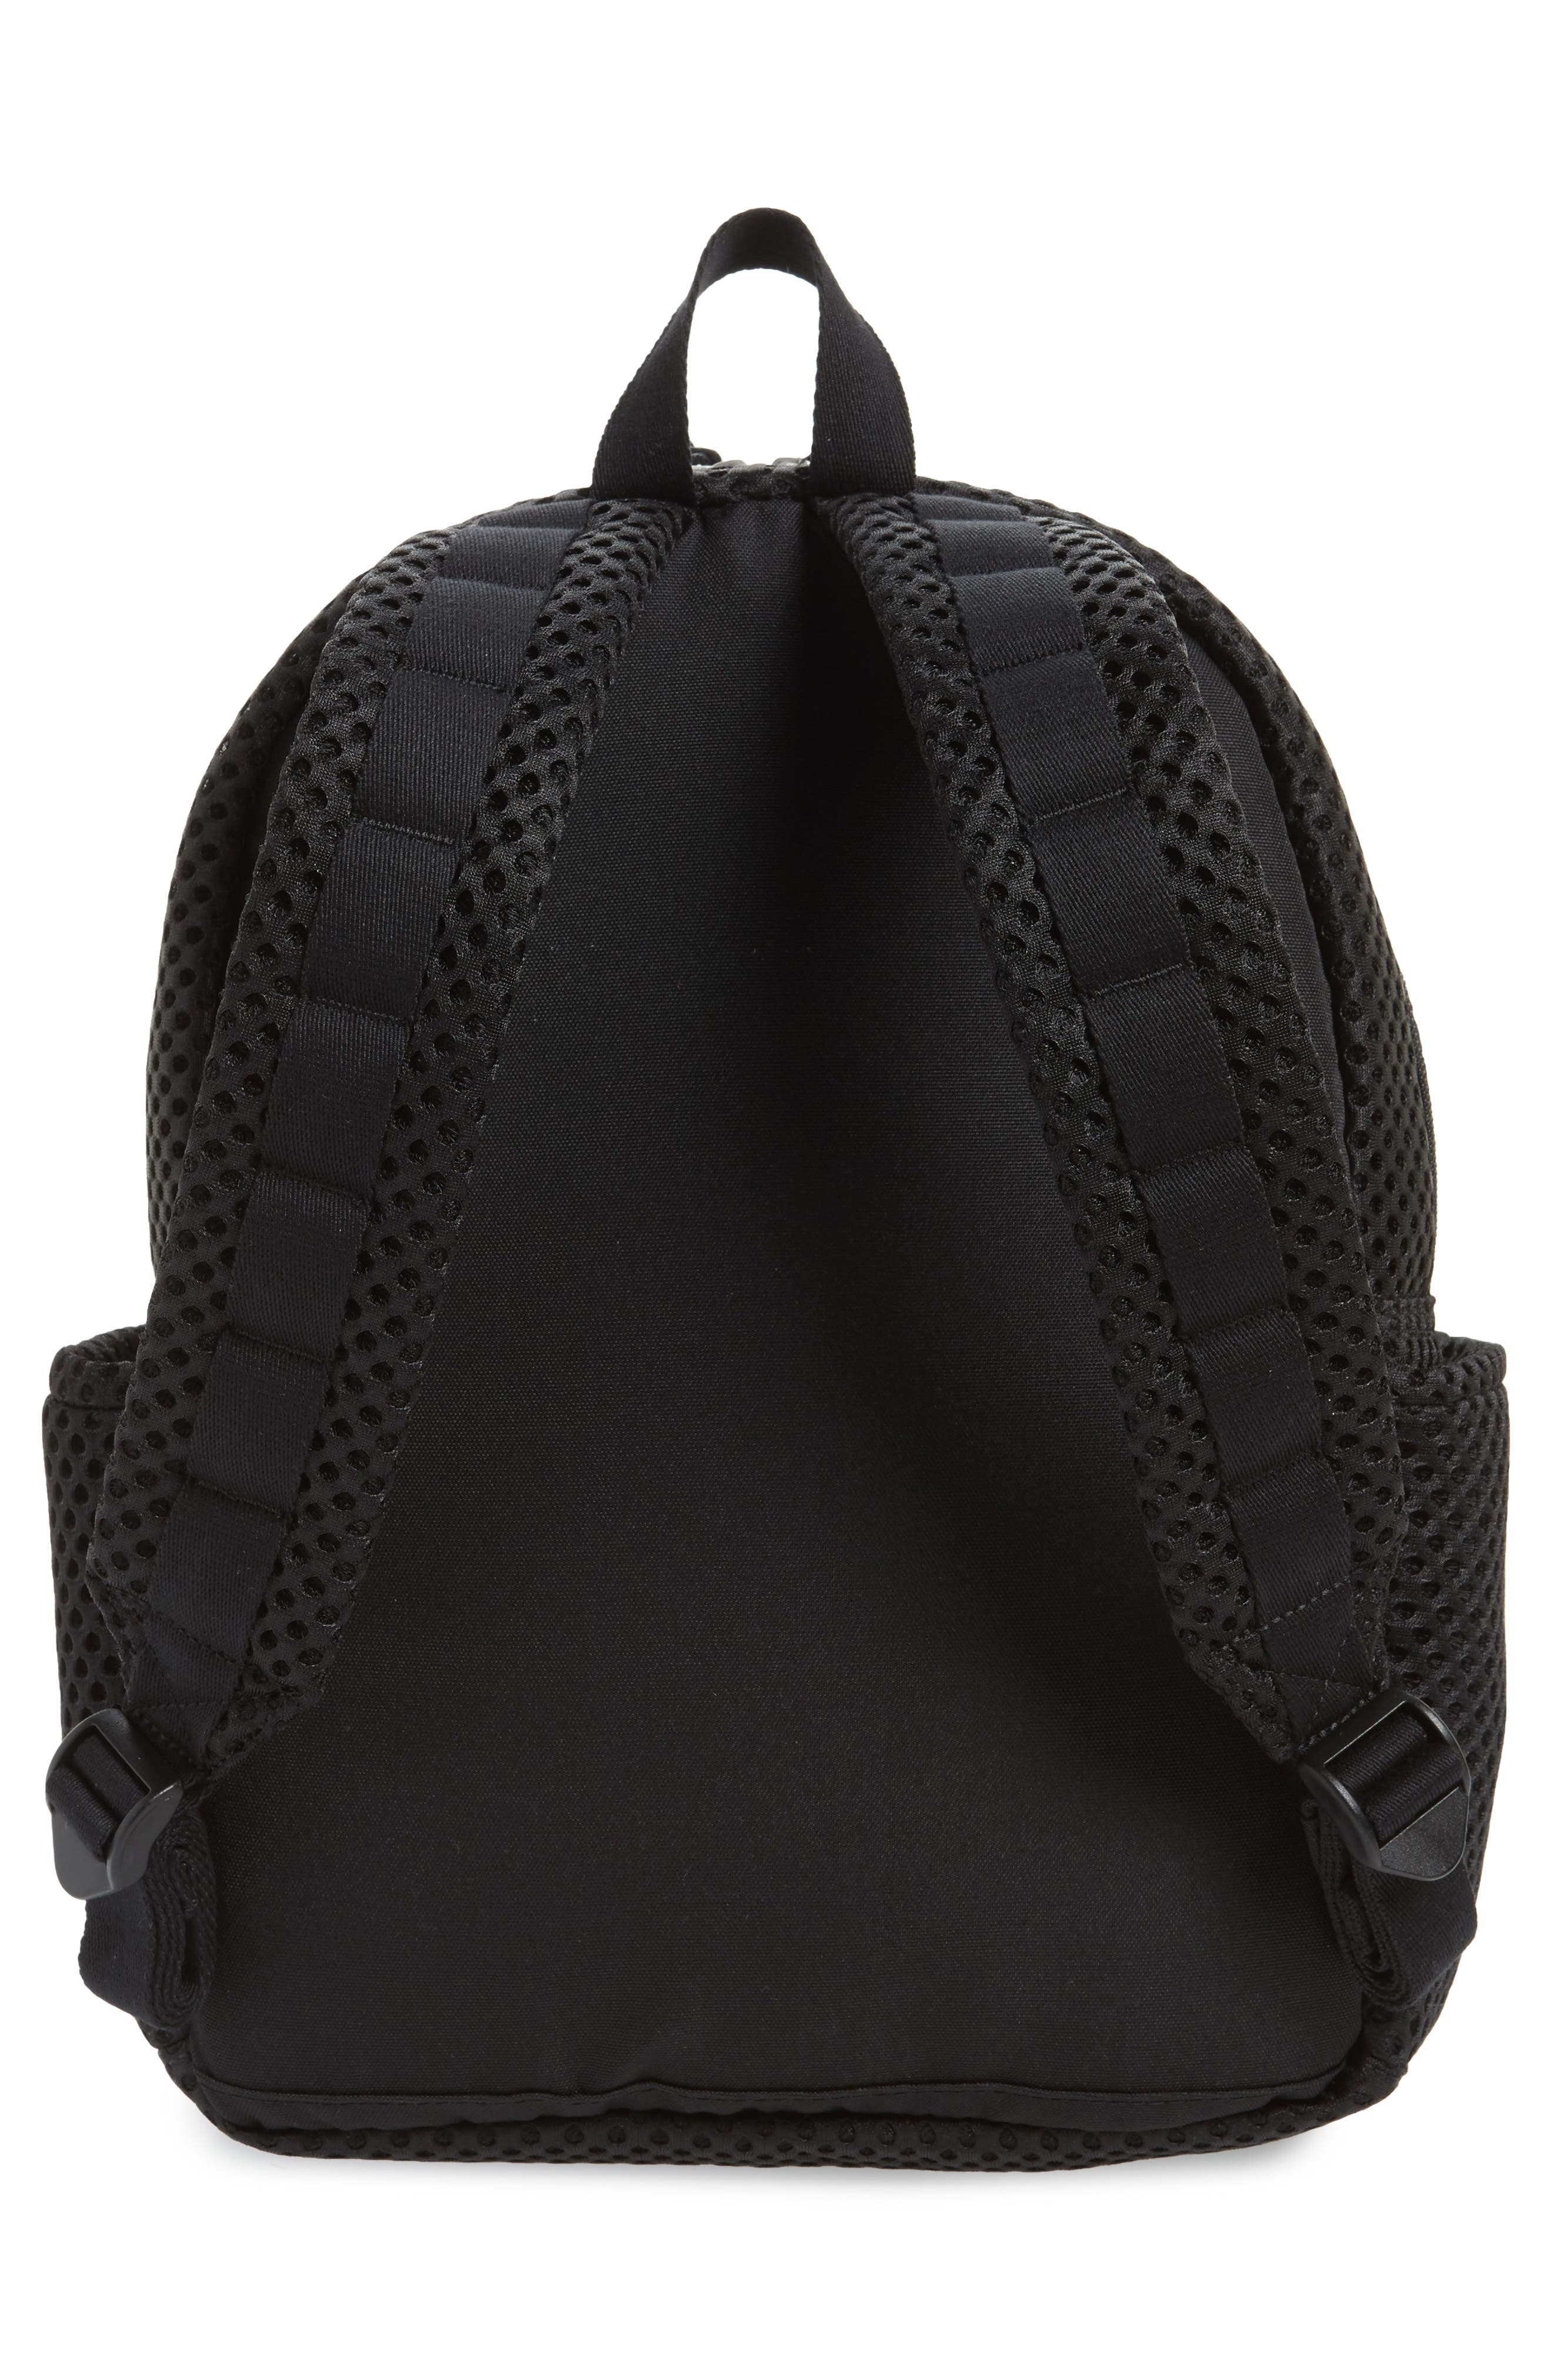 Lacrosse Mesh Kane Backpack,                             Alternate thumbnail 3, color,                             Black